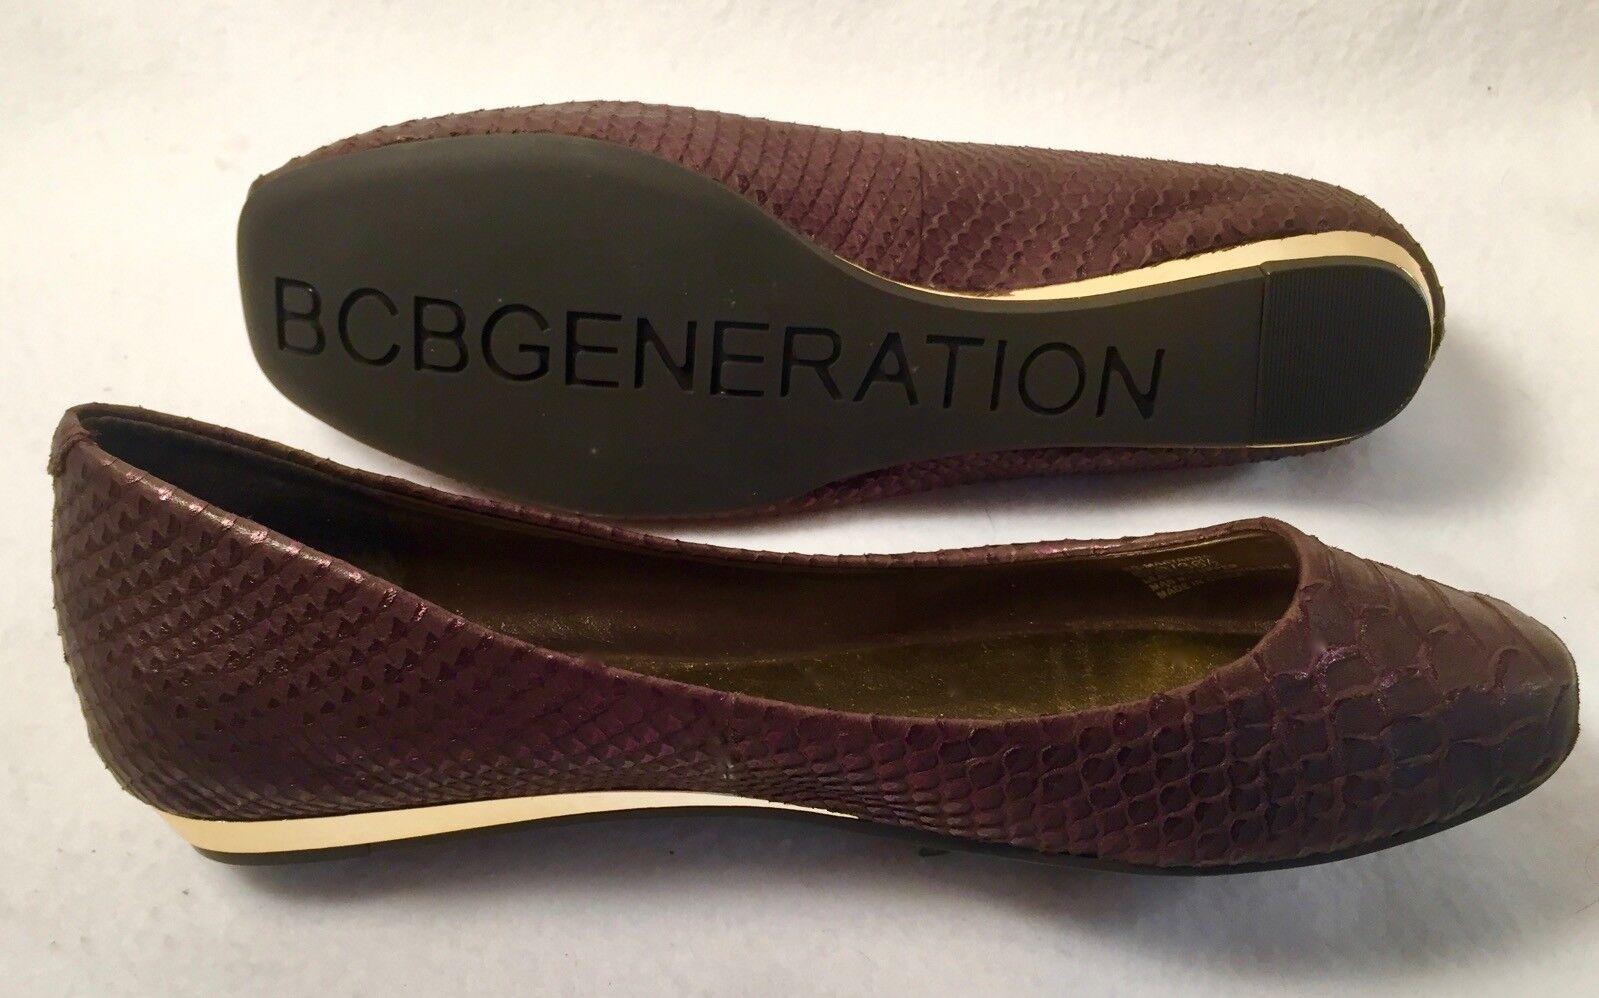 Women's BCBGeneration 'Maryanna' brown leather Snakeskin print Ballet flats 6B